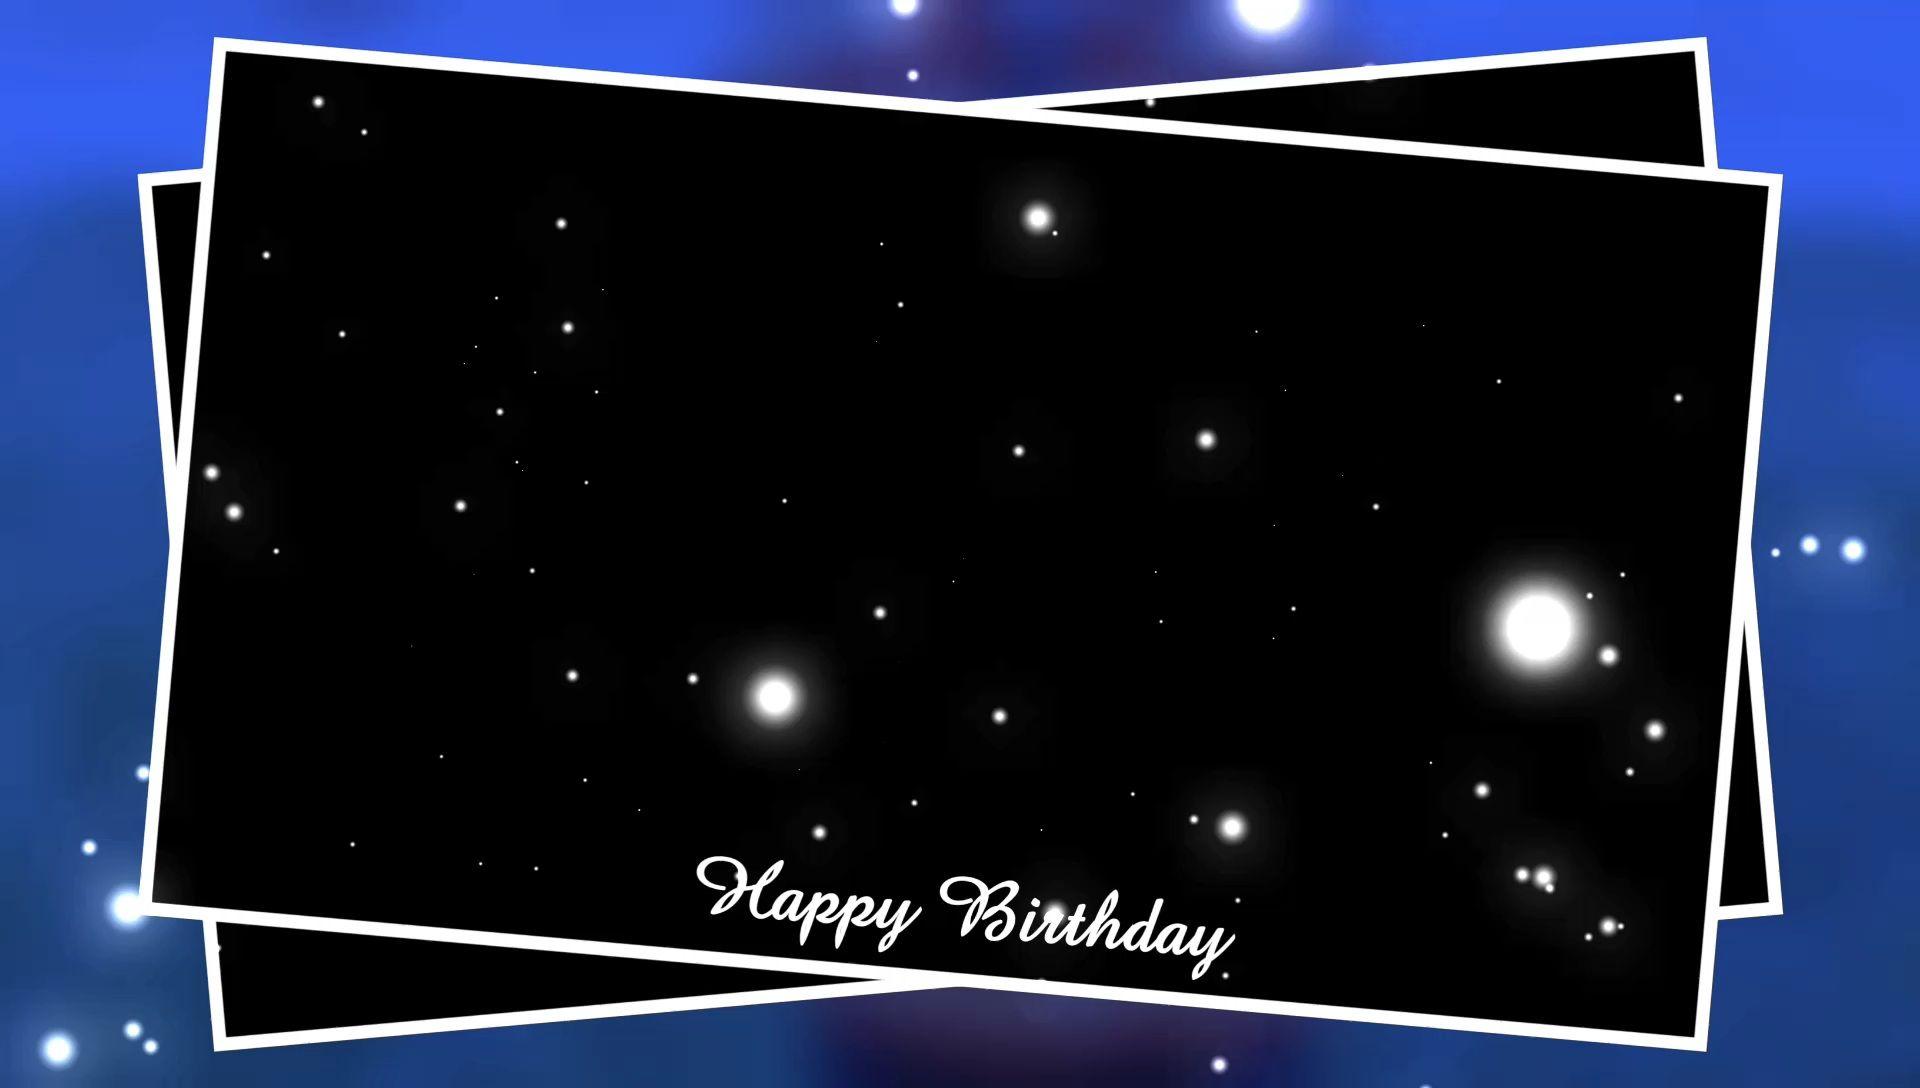 Happy Birthday Kinemaster Template Video Download